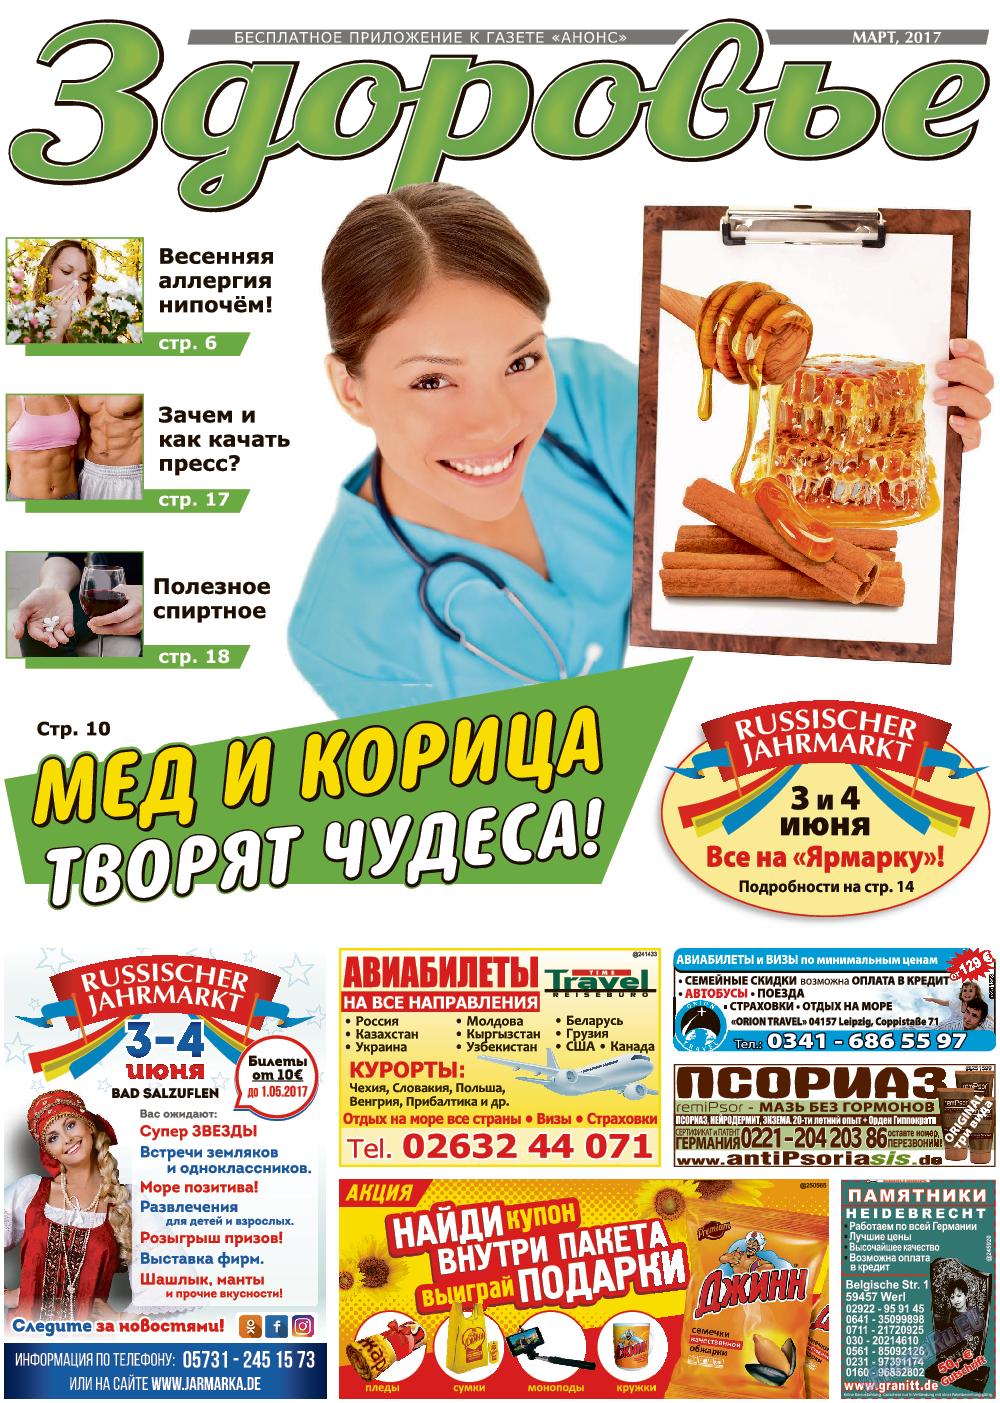 Здоровье (газета). 2017 год, номер 3, стр. 1